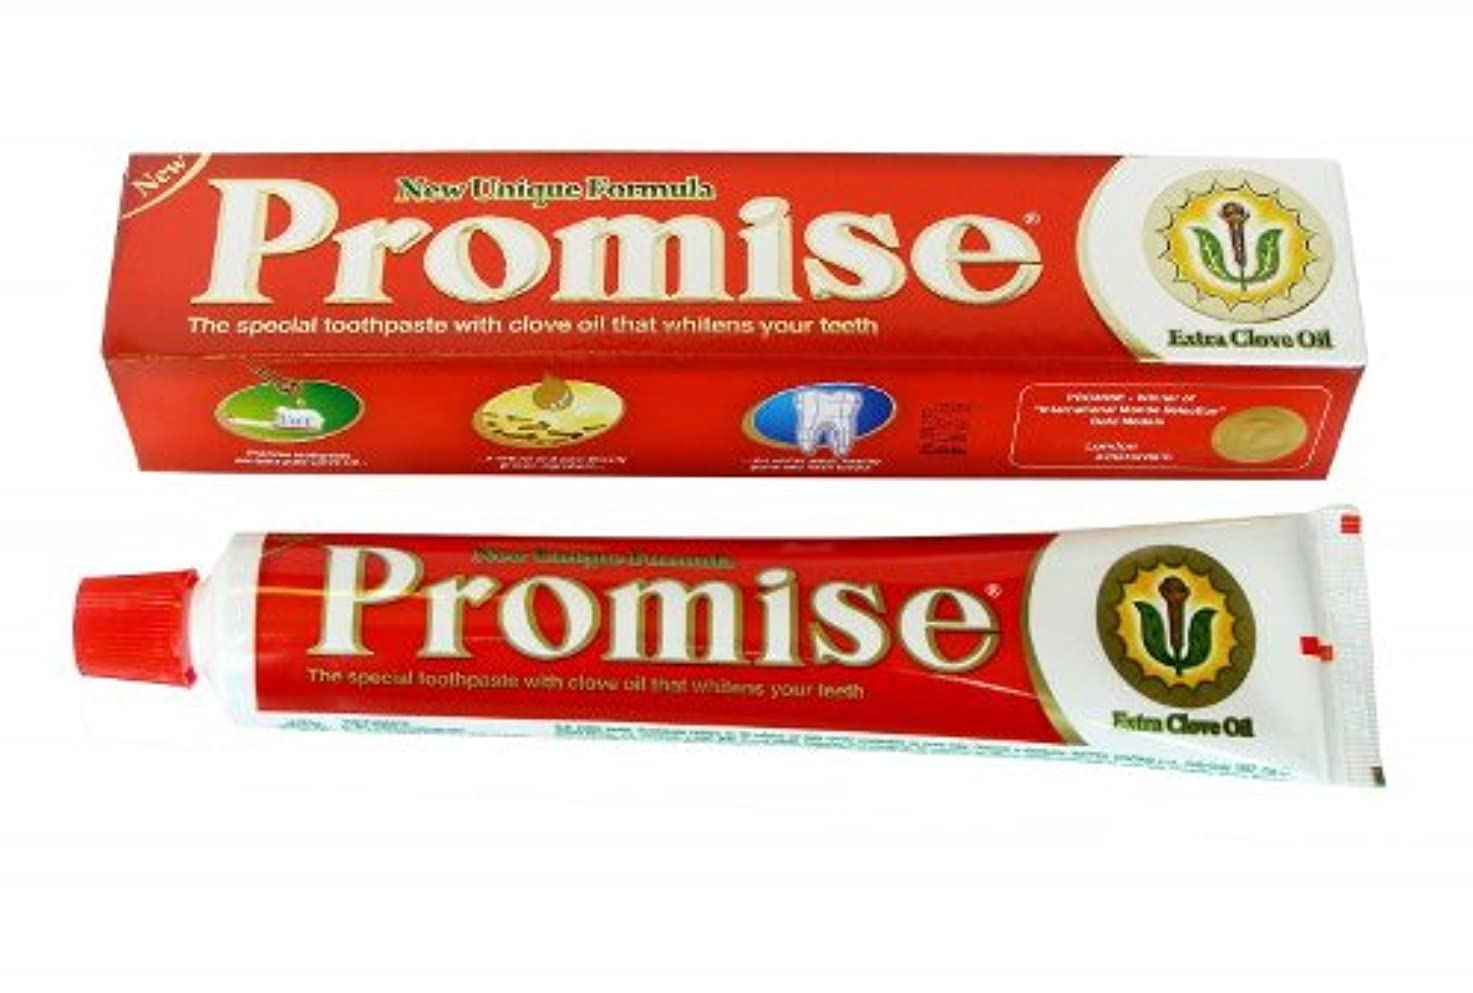 Dabur Promise チョコレートオイル入り練り歯磨き 150g 2個 [並行輸入品]